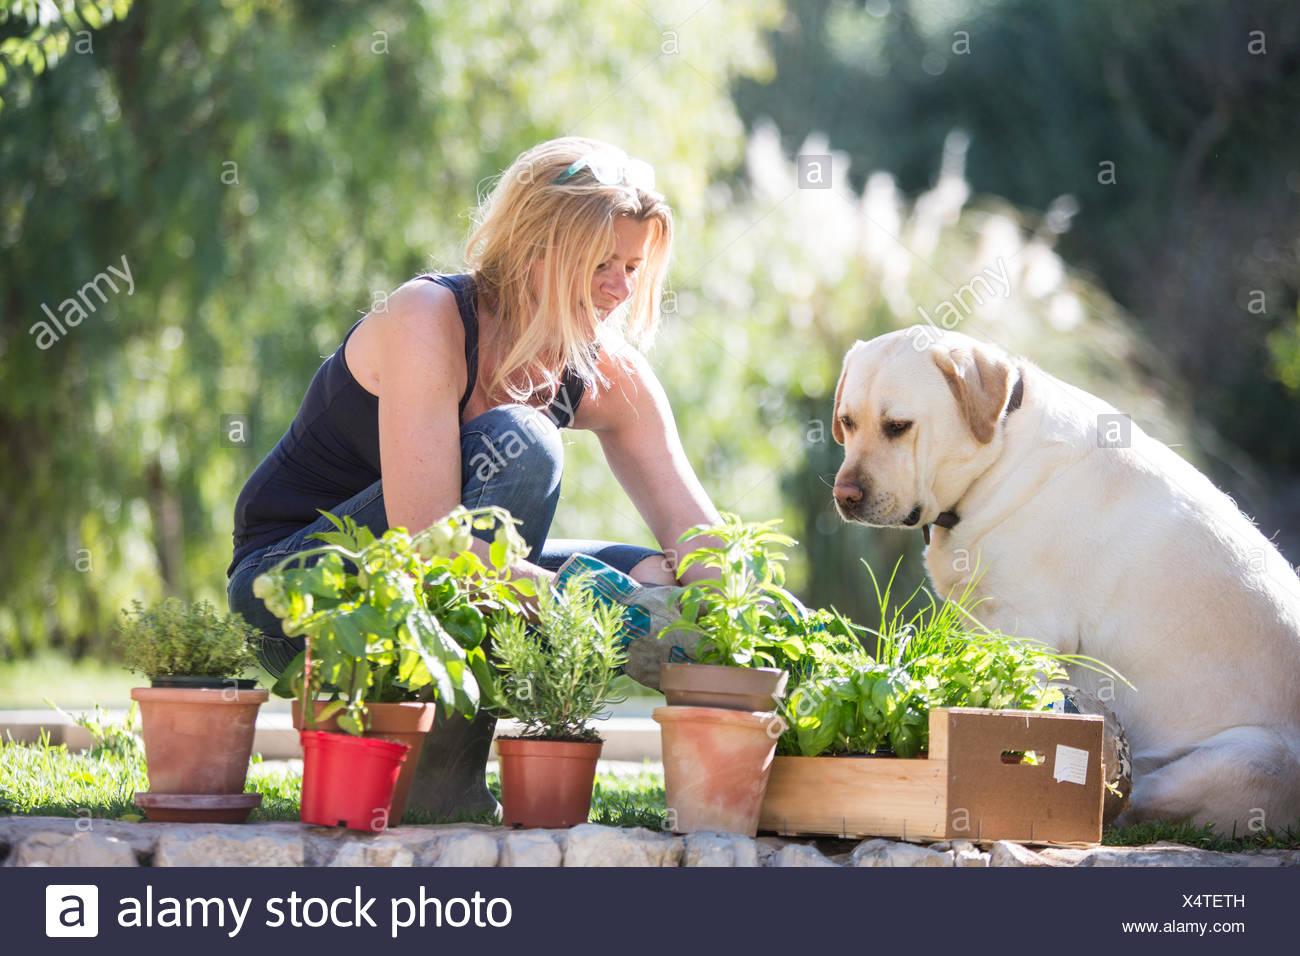 Labrador dog watching woman tending plants in garden - Stock Image